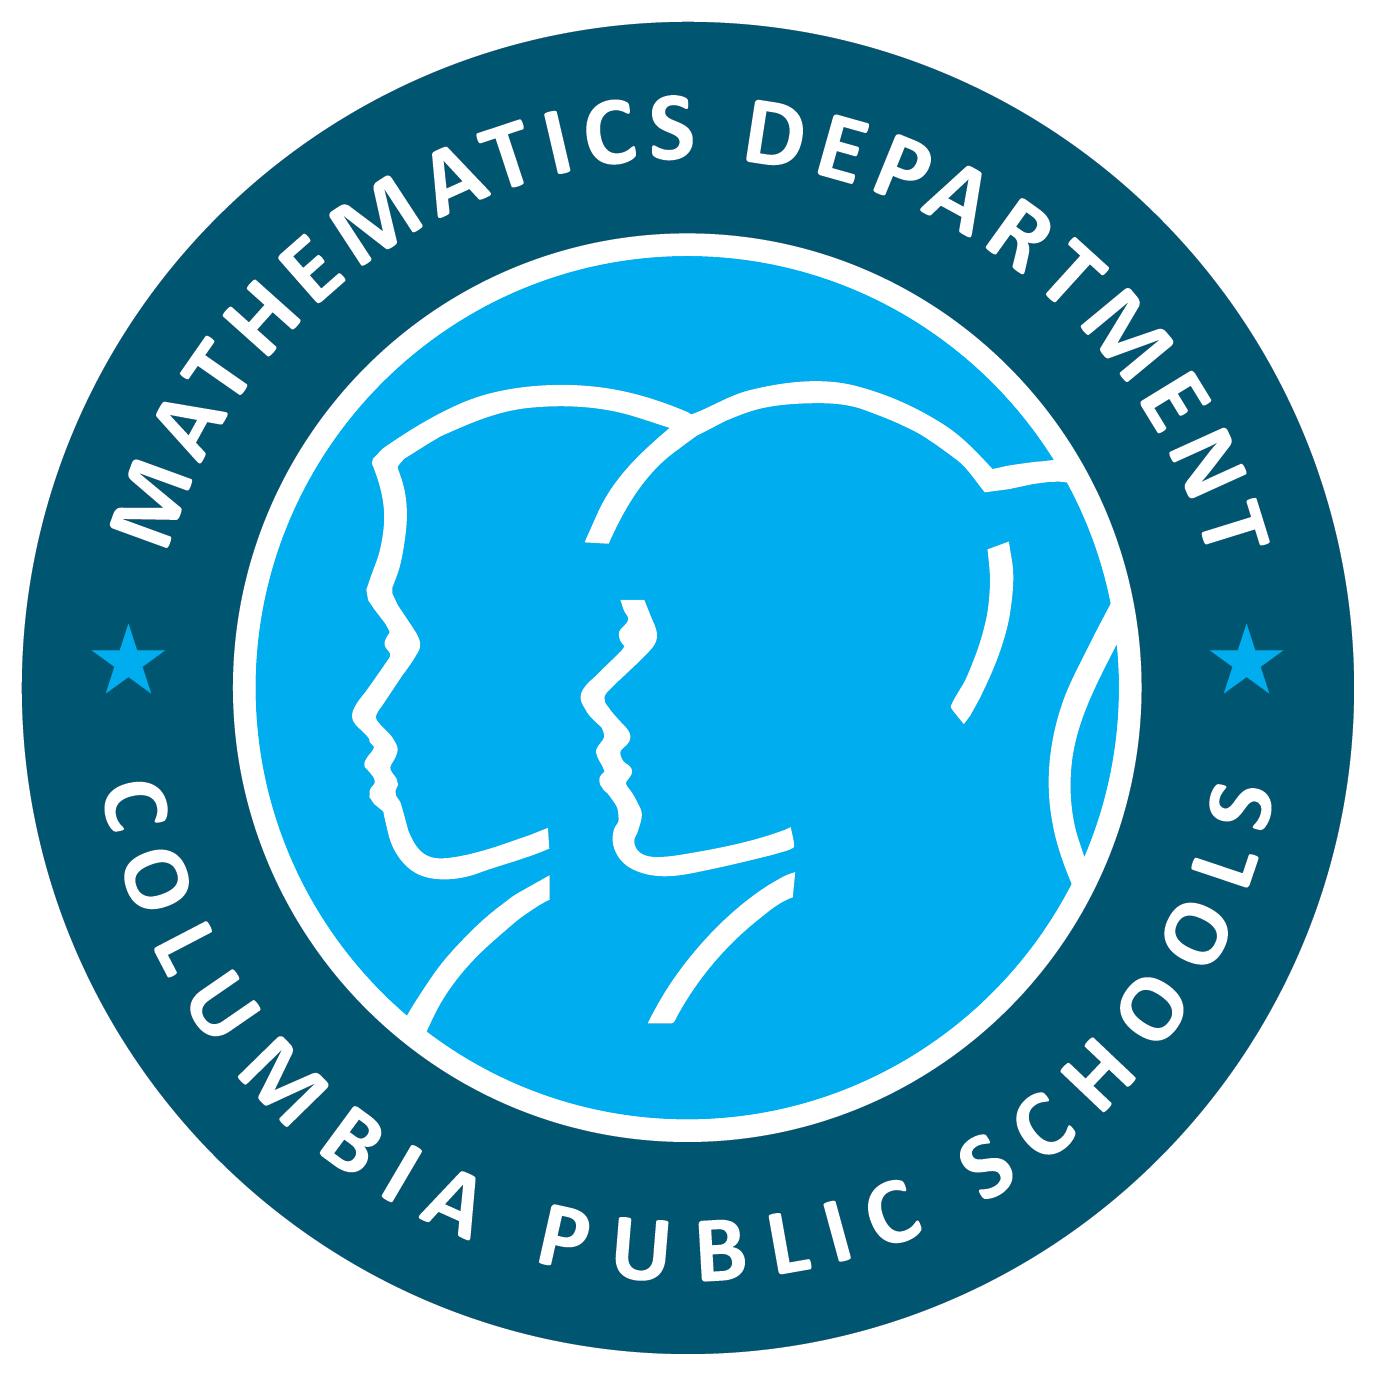 MathematicsDepartmentLogo